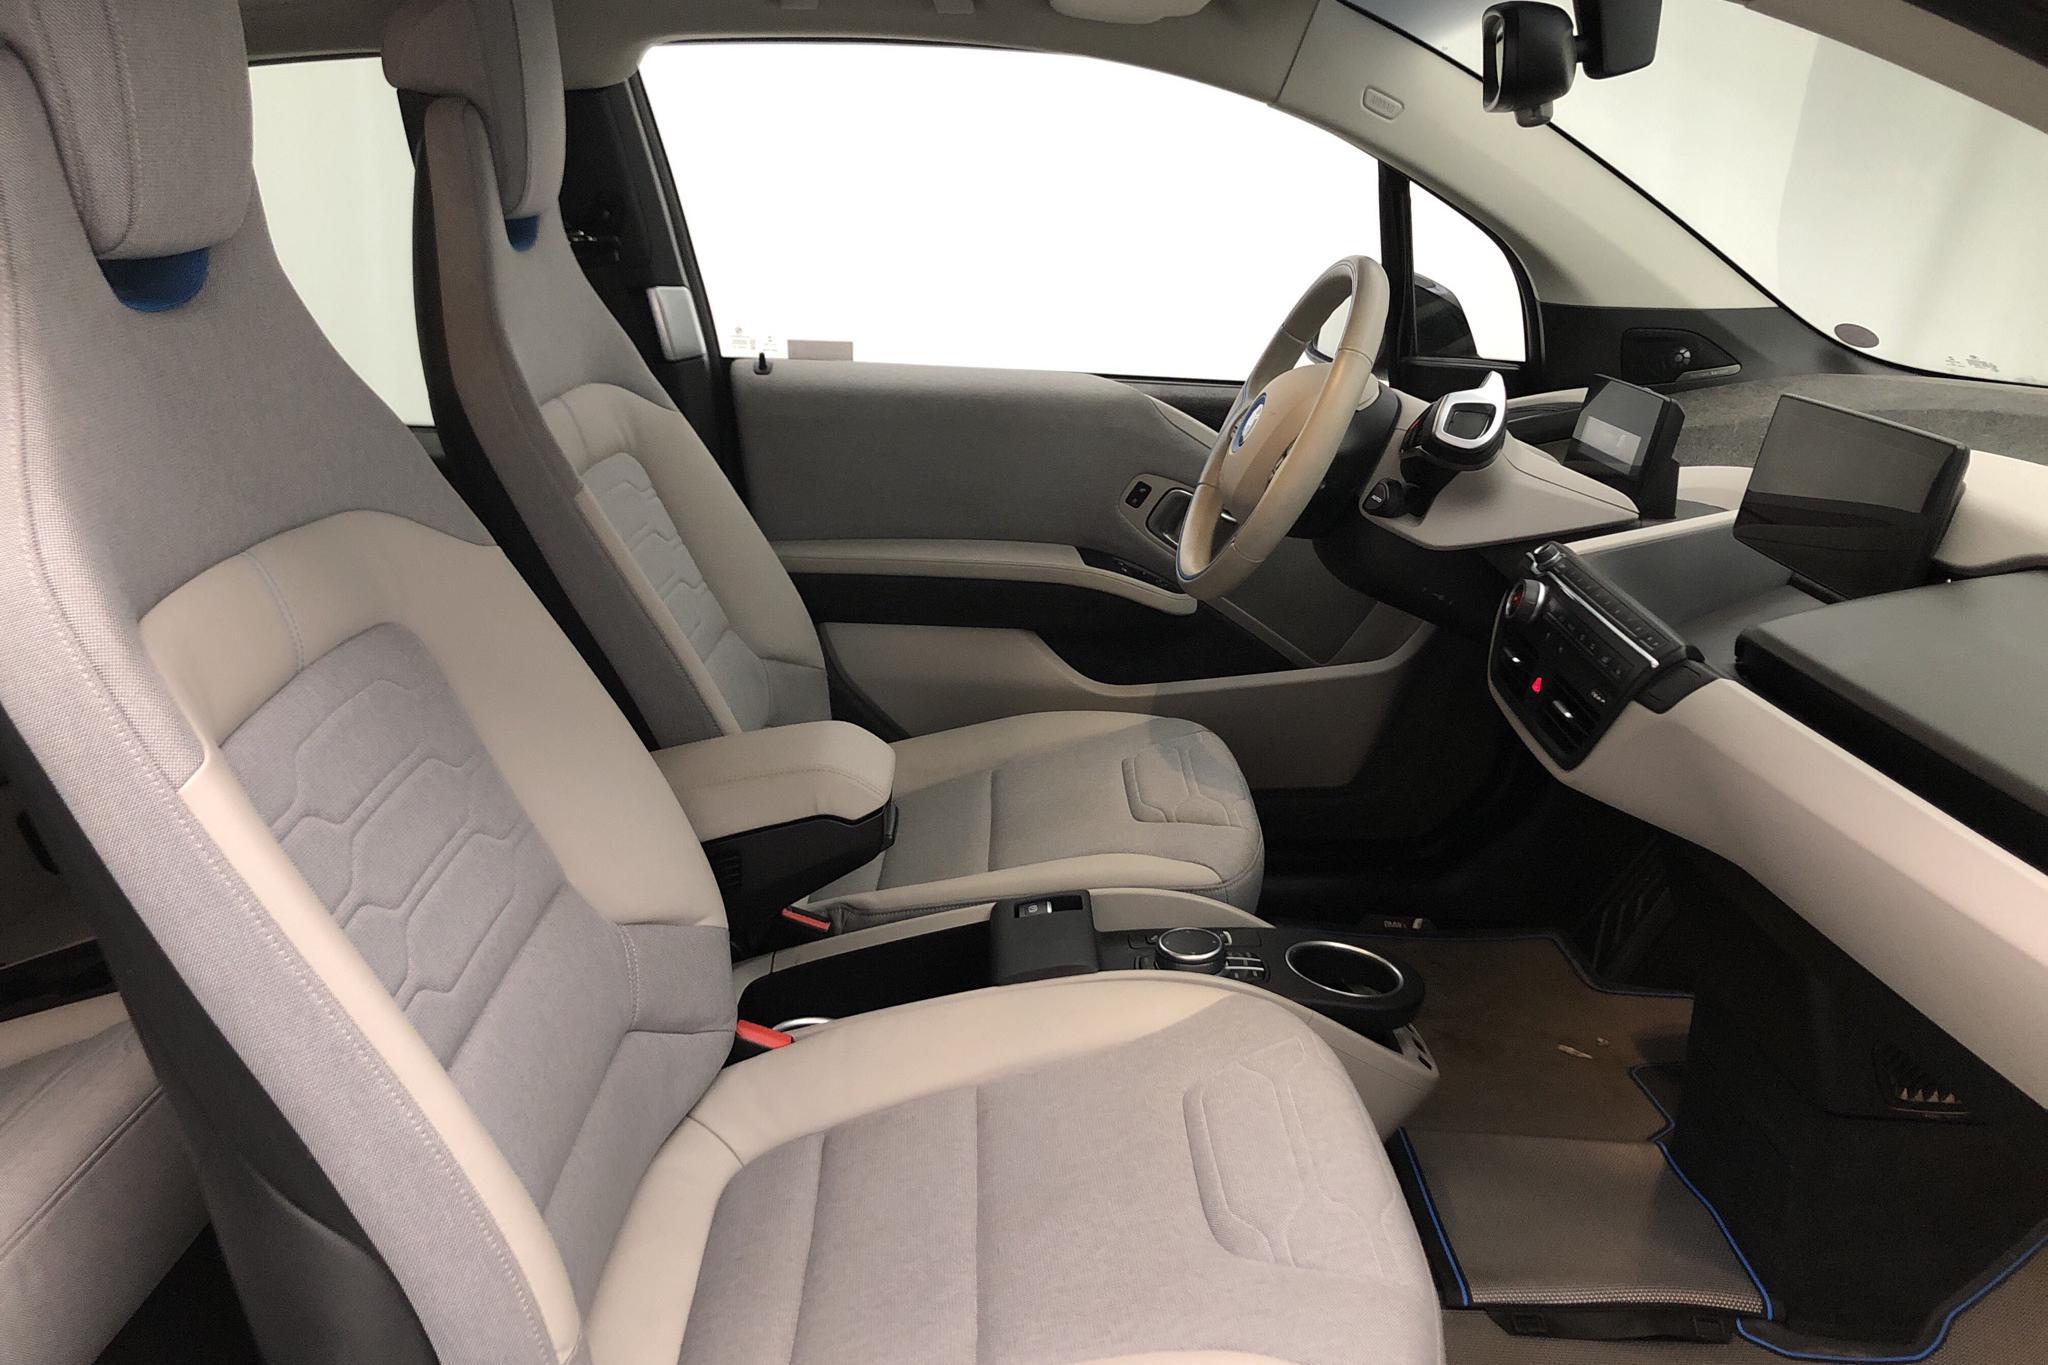 BMW i3s 94Ah, I01 (184hk) - 37 810 km - Manual - blue - 2018